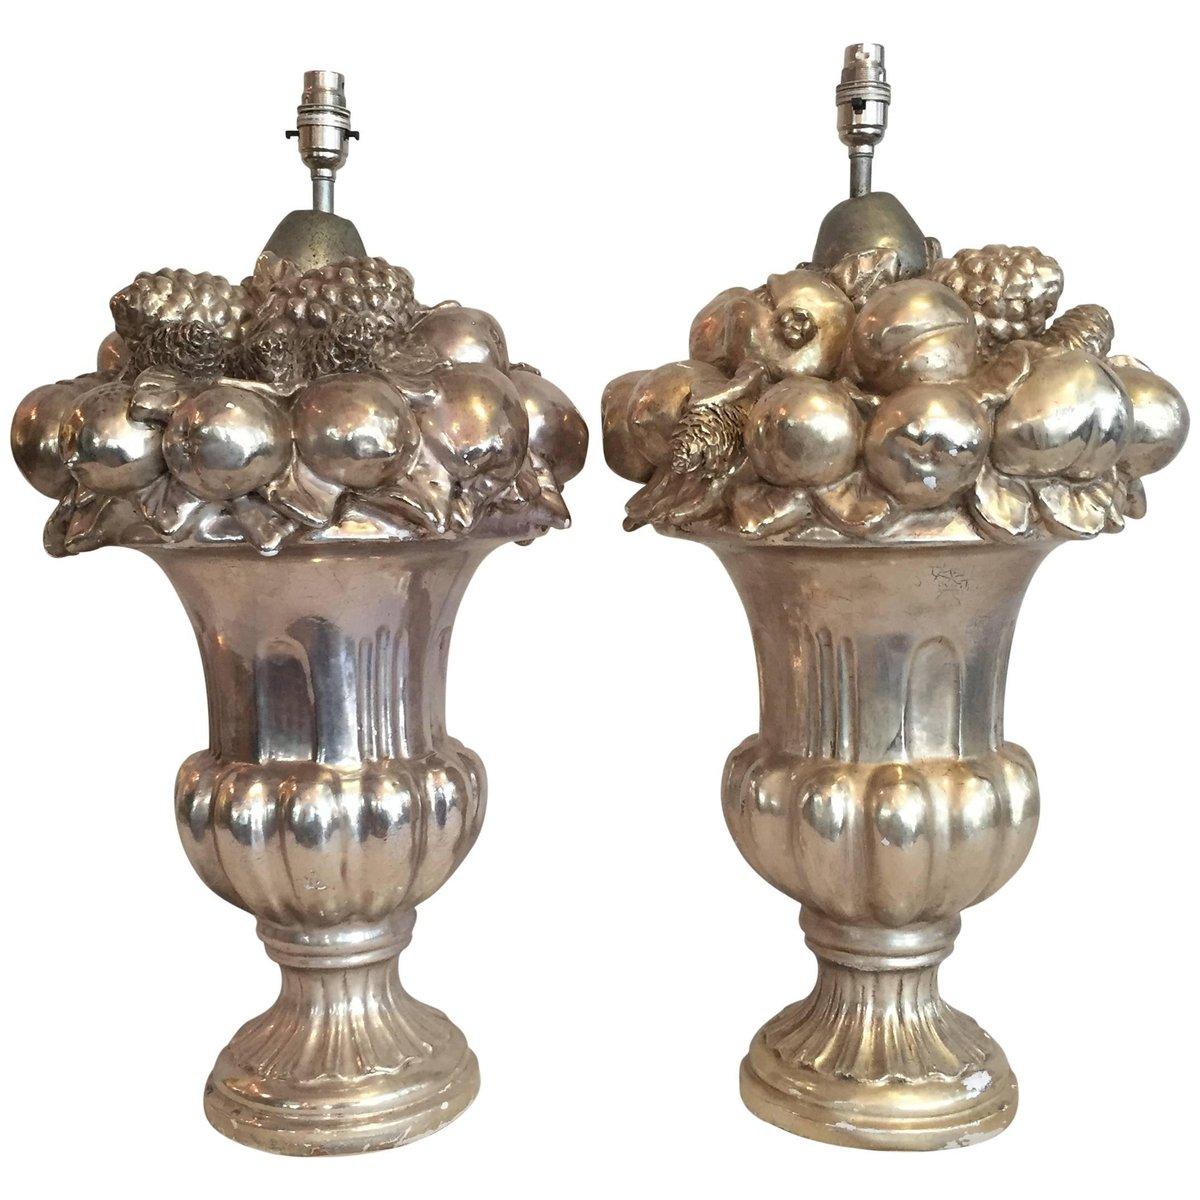 Große italienische Tischlampe aus versilberter Keramik, 1970er